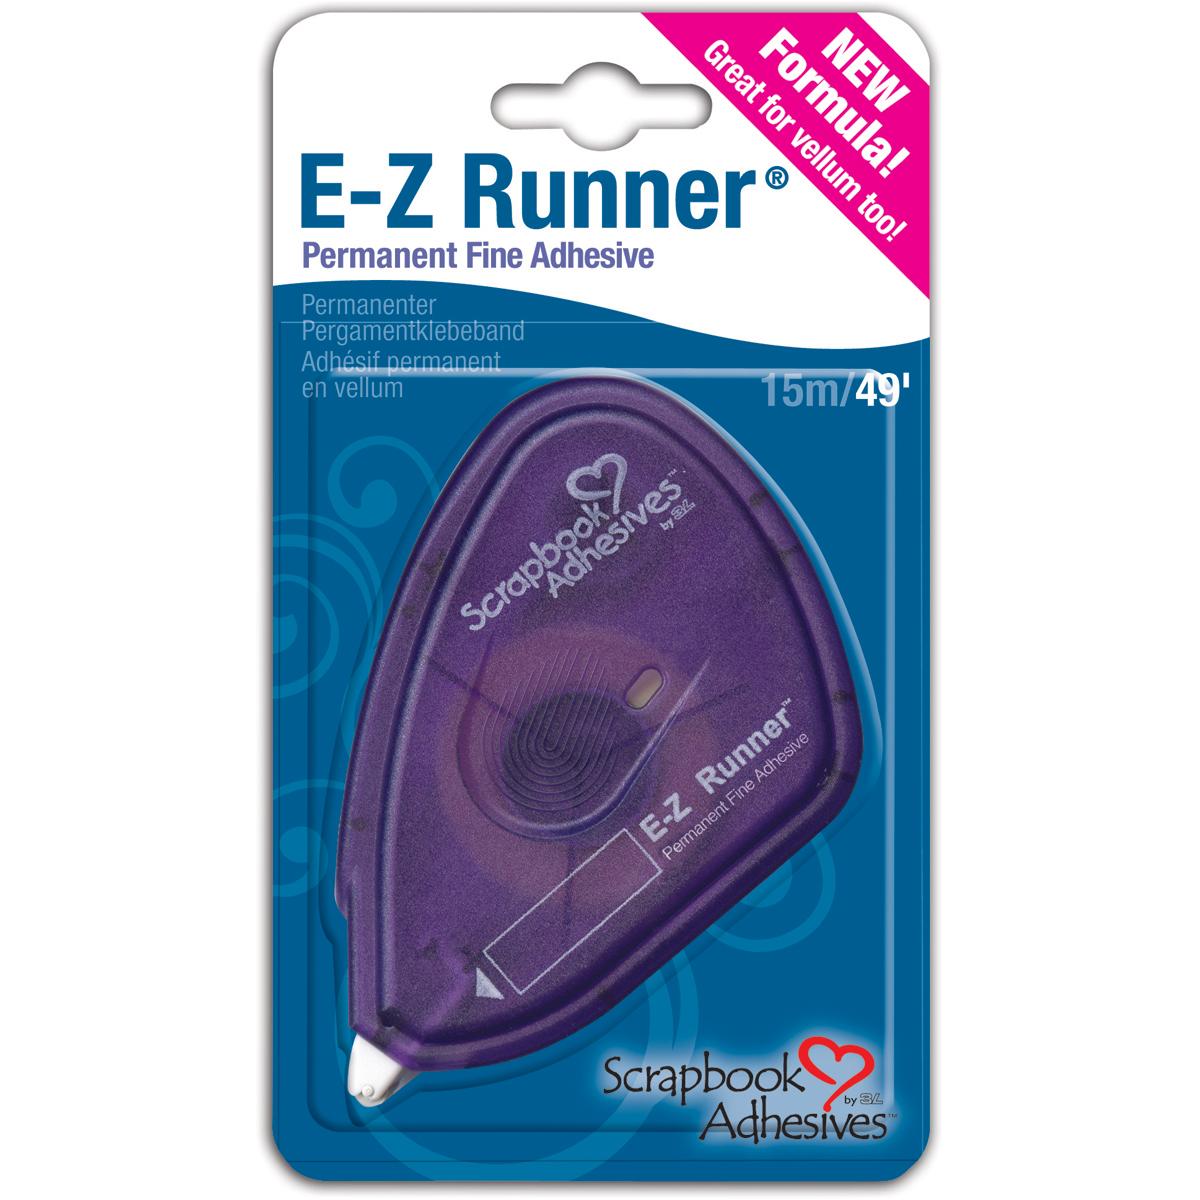 Scrapbook Adhesives E-Z Runner Fine Adhesive-Permanent, .375X49'